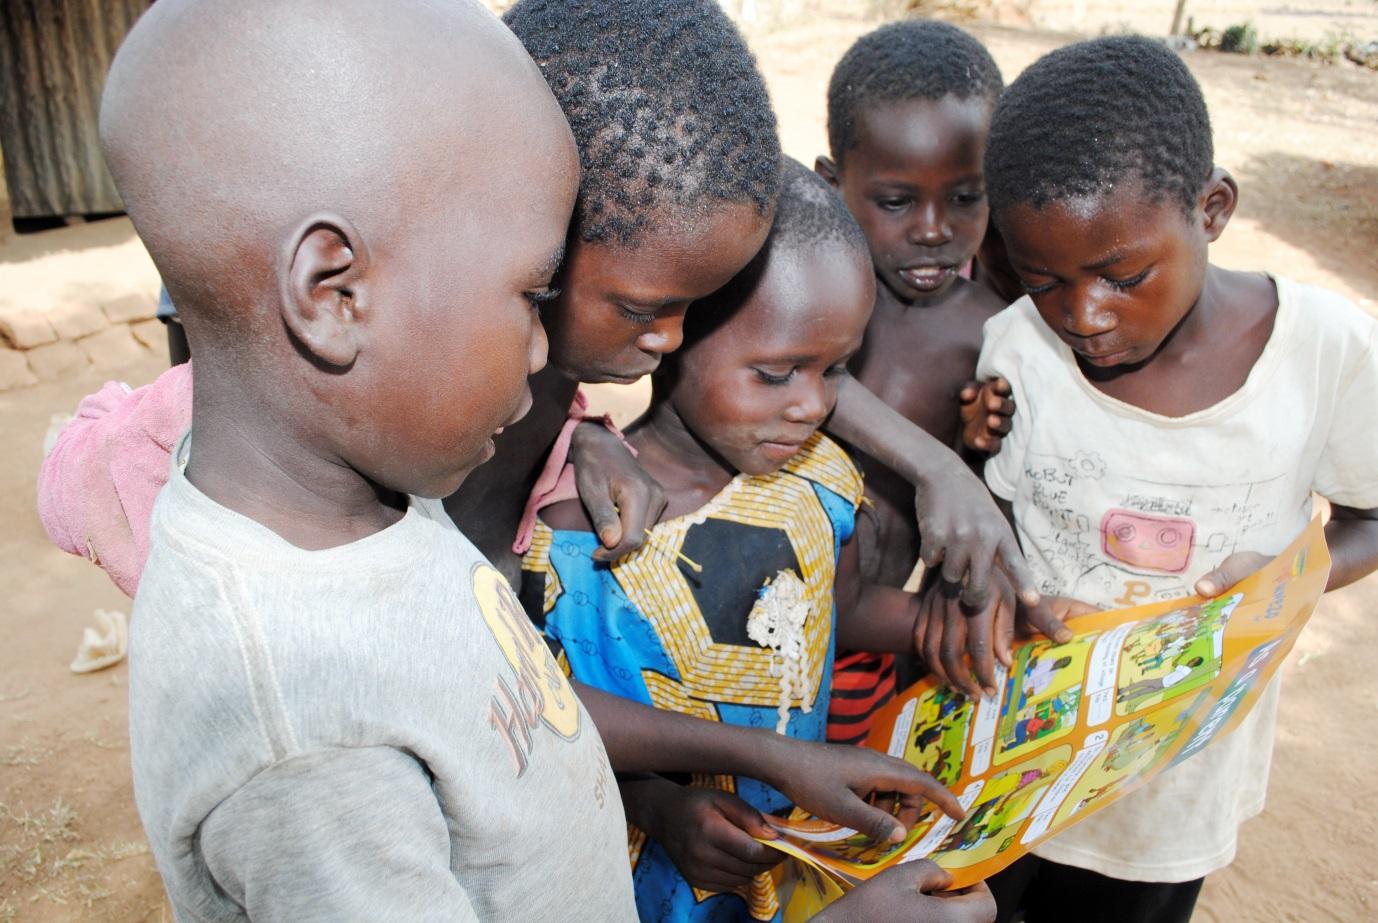 Children looking at an Uwezo Poster, Kumi District, Uganda, April 2012